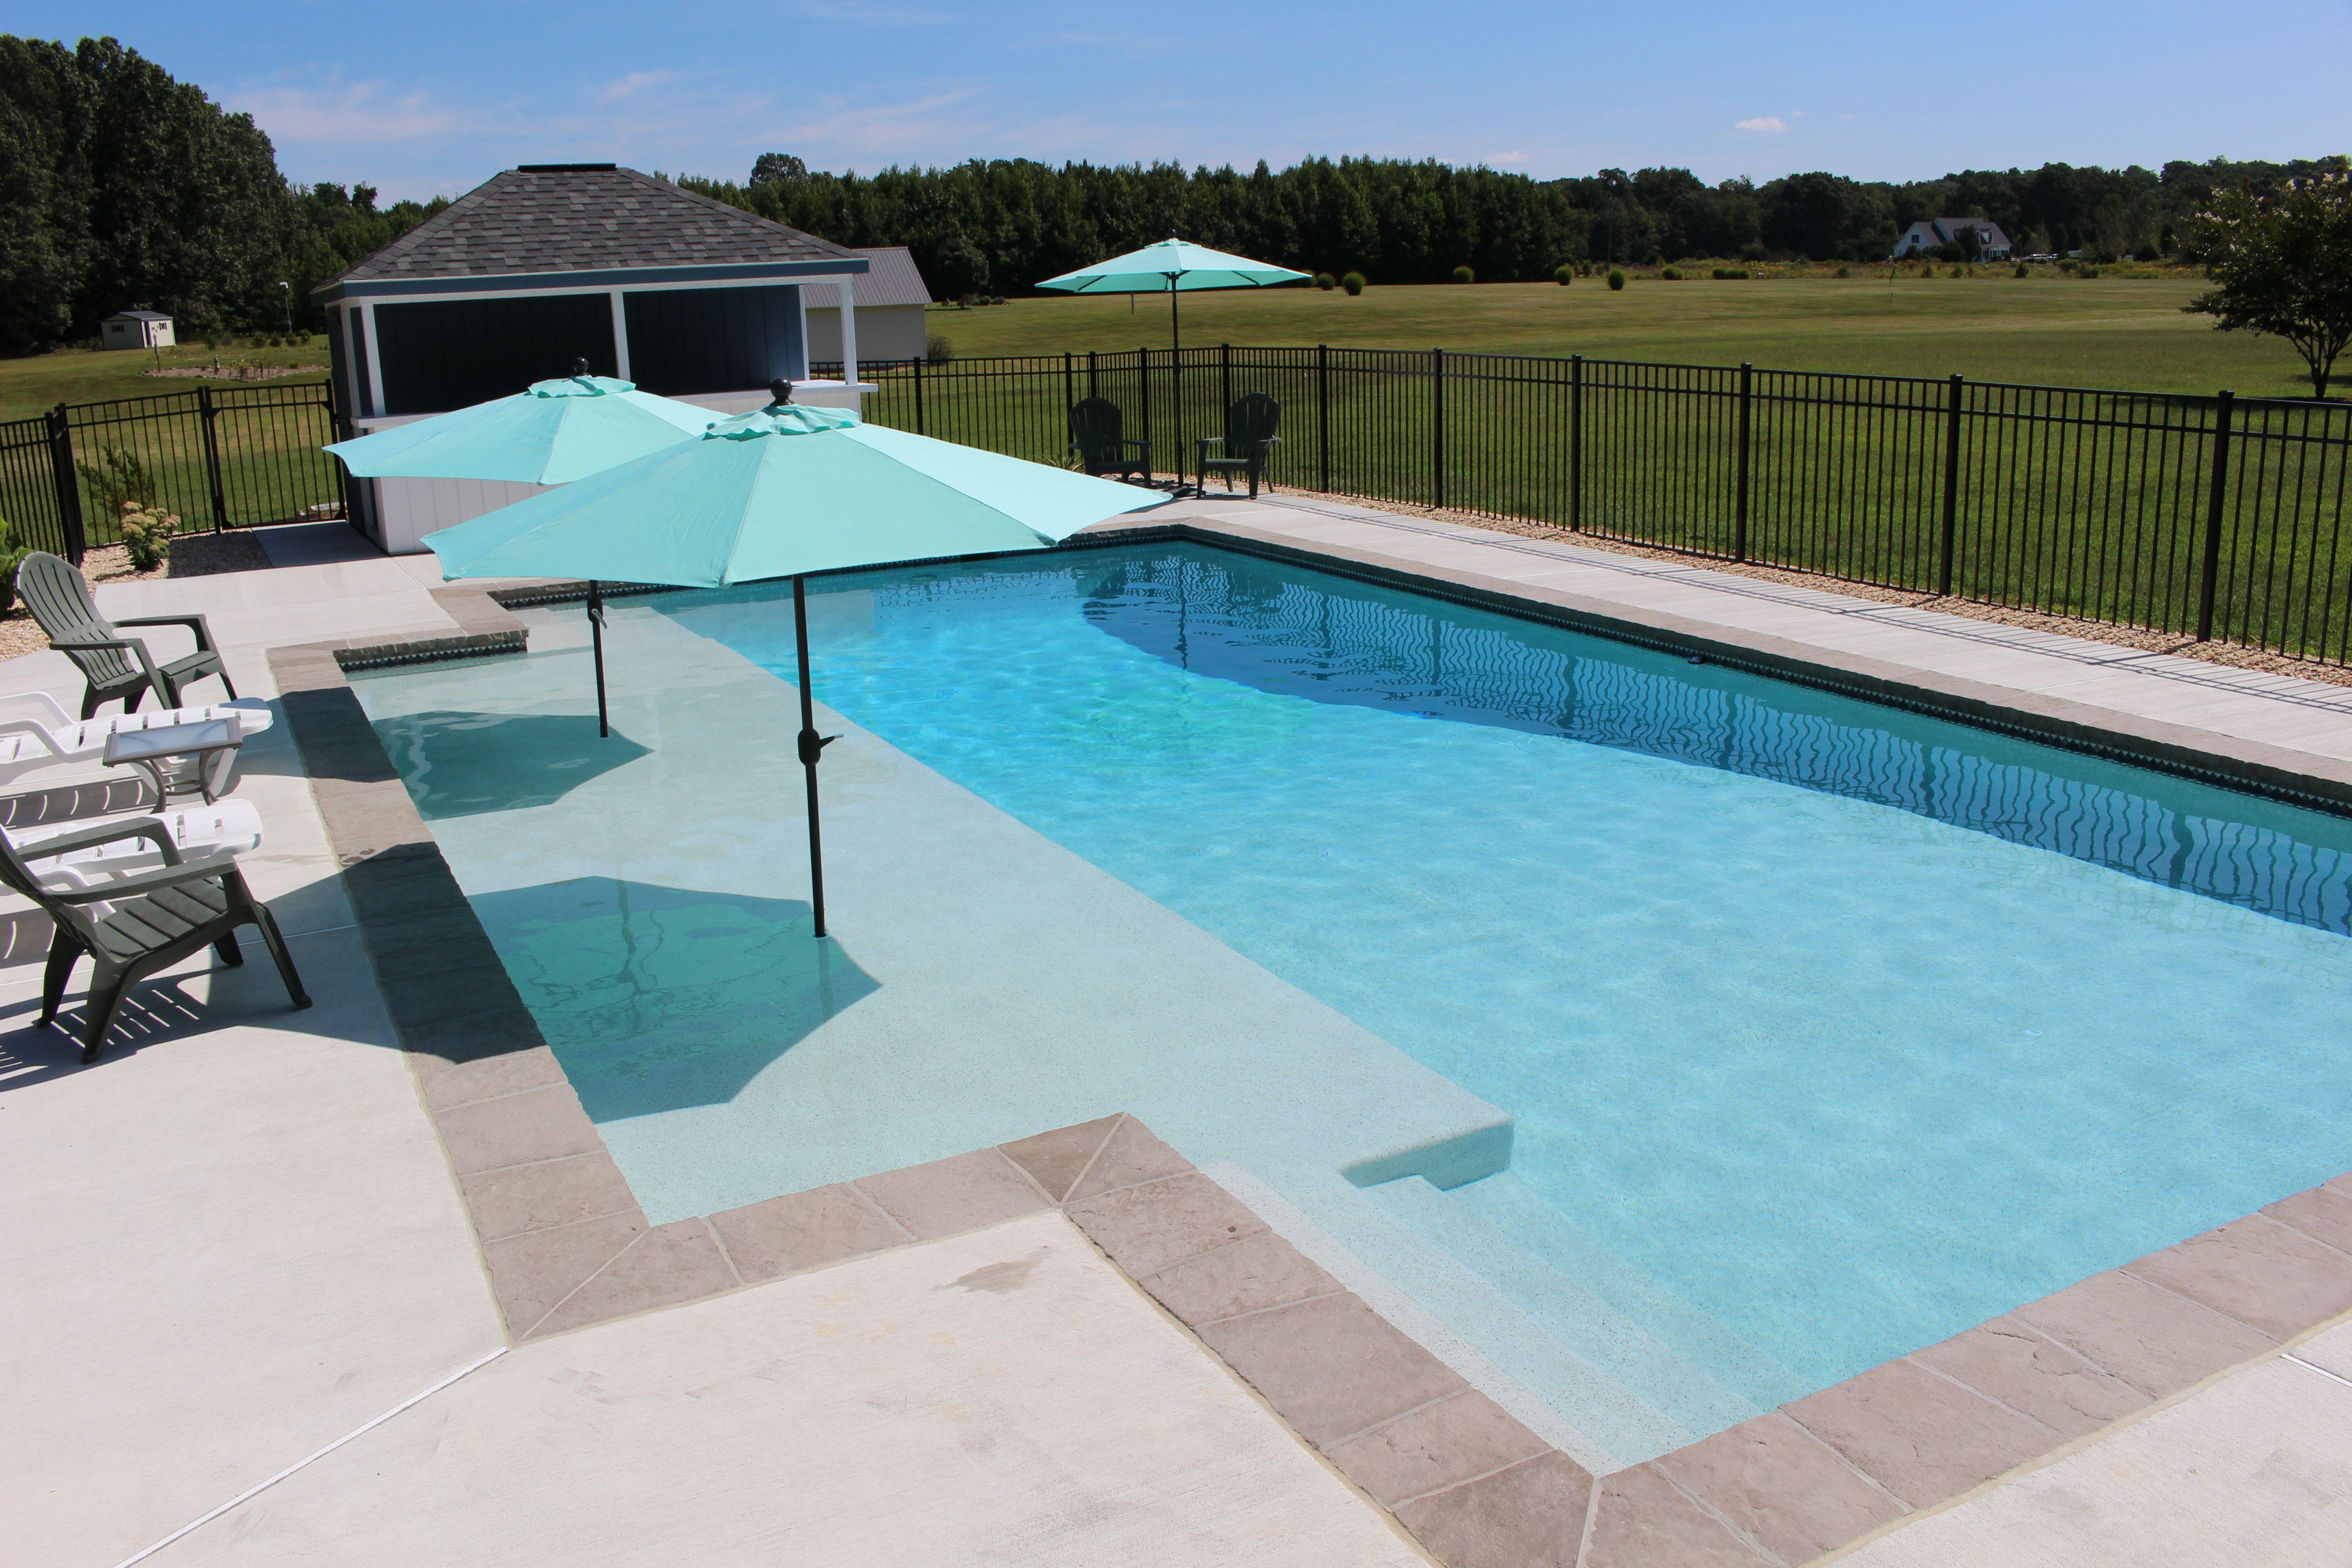 Pool With Sun Shelf 11 Rectangle Pool Pools Backyard Inground Pool Remodel